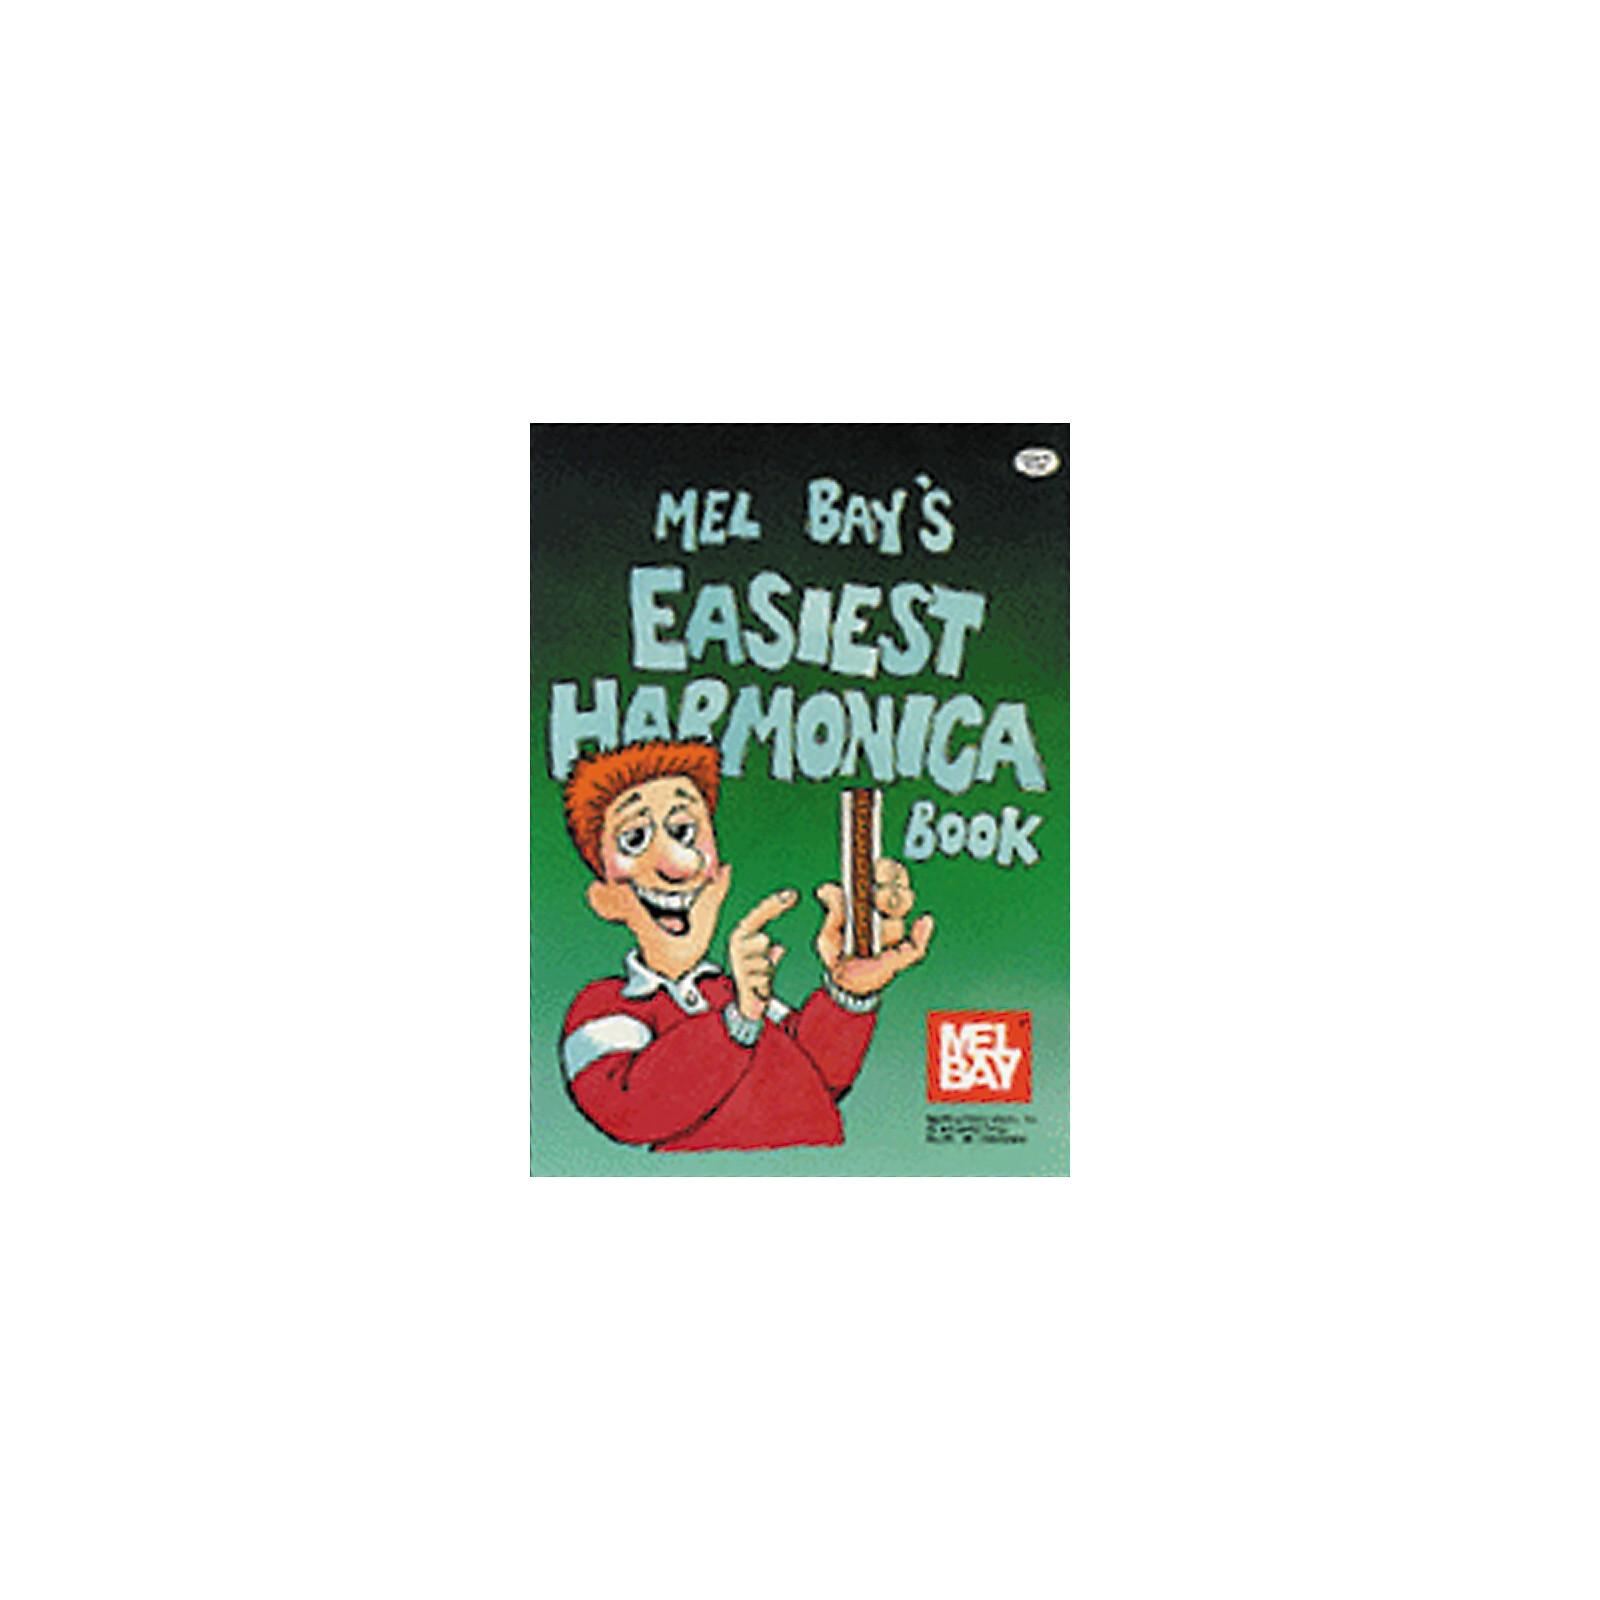 Mel Bay Easiest Harmonica Book